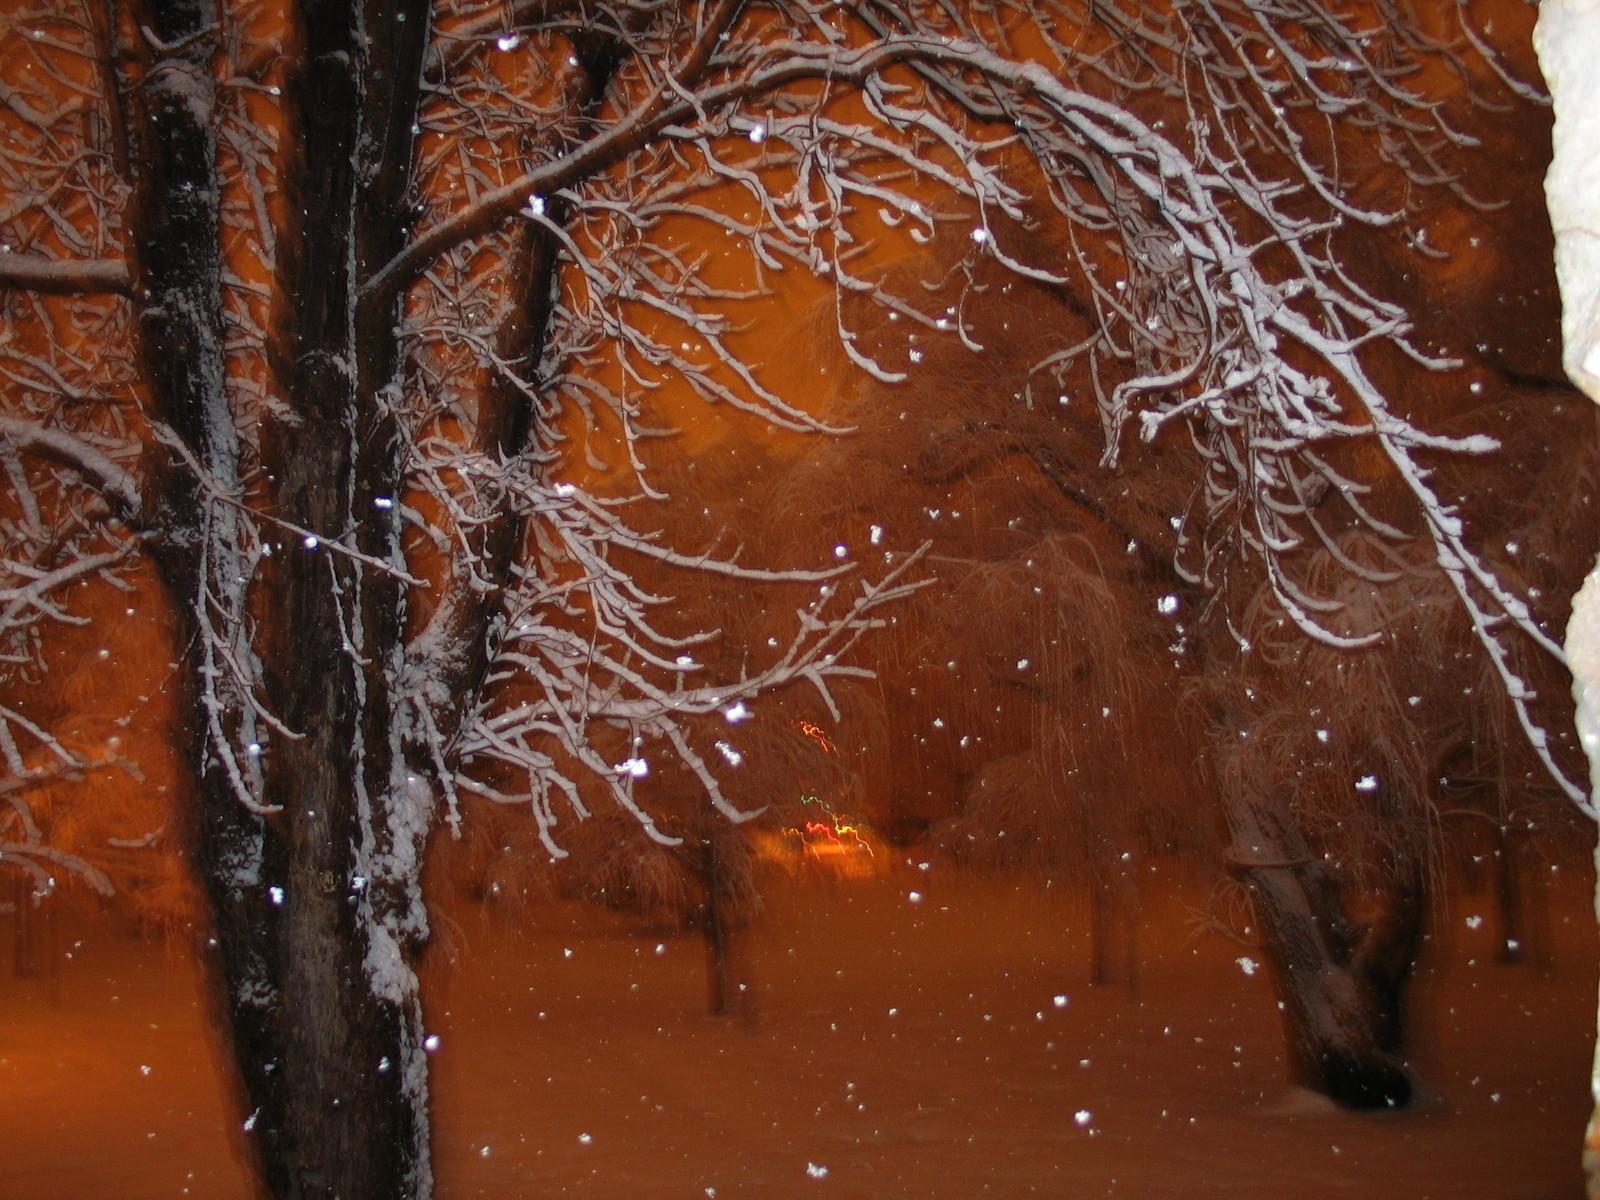 snow-trees-2-1489678-1600x1200